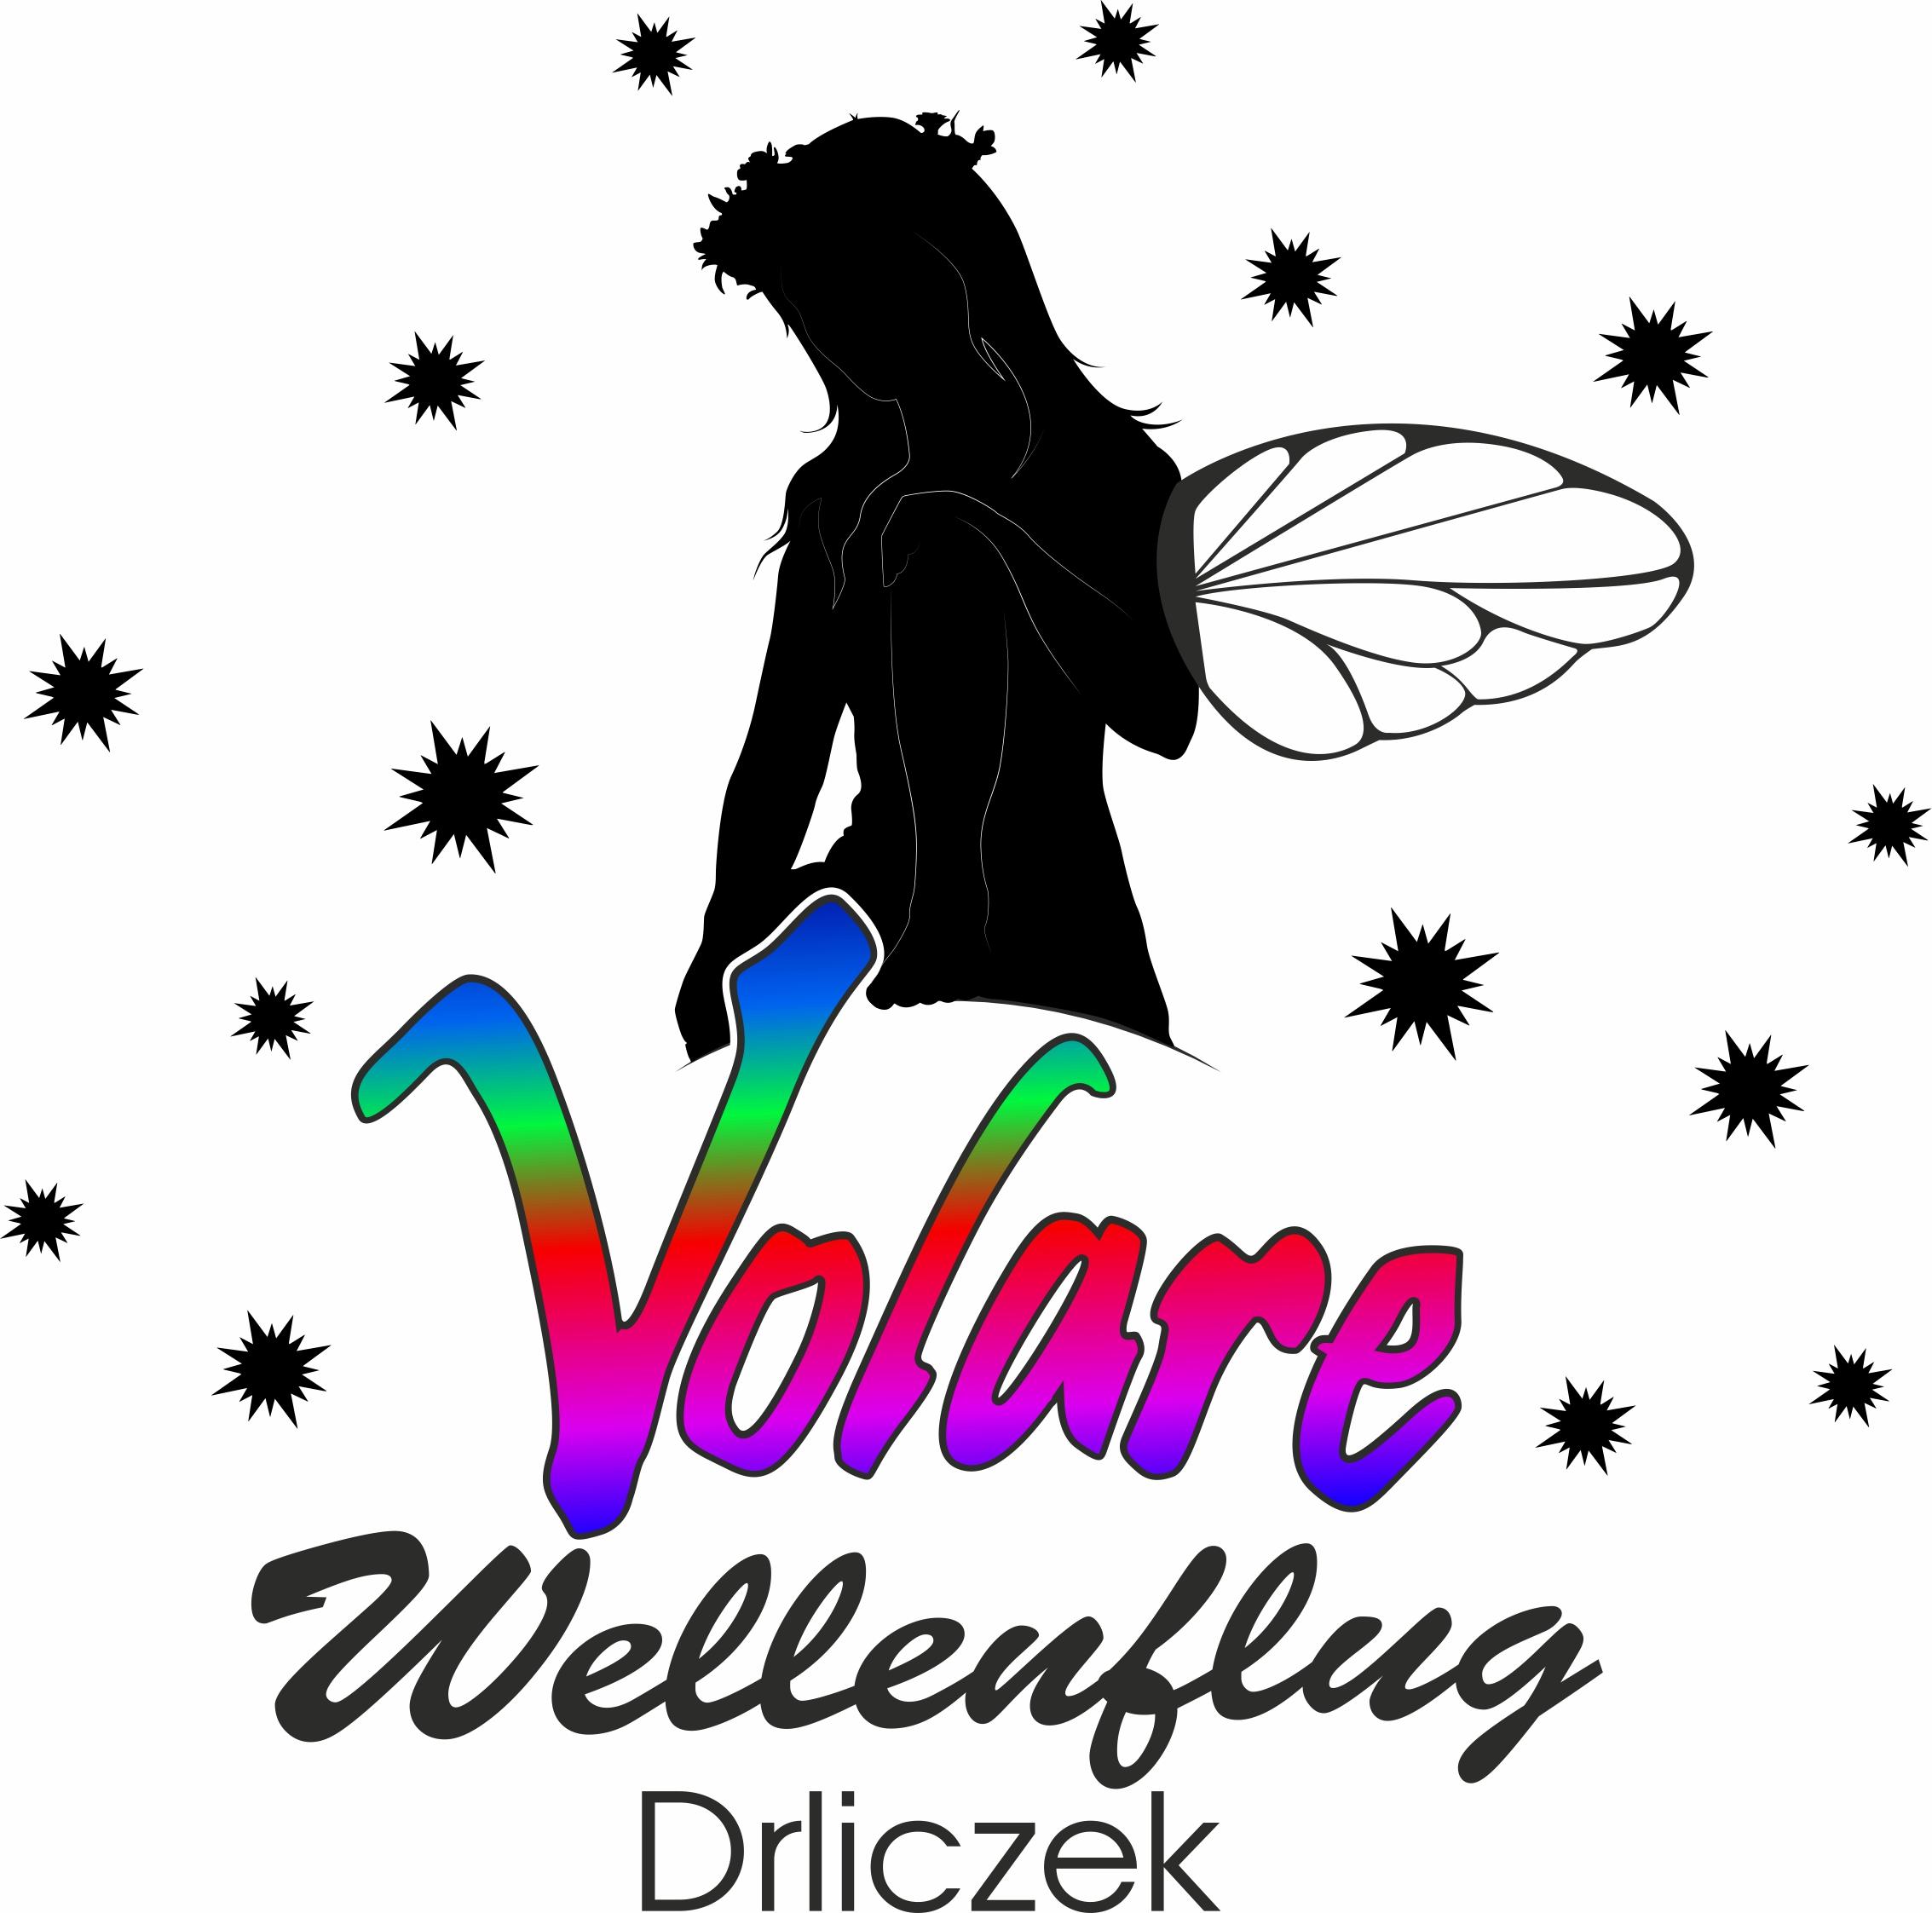 Volare Wellenflug Drliczek